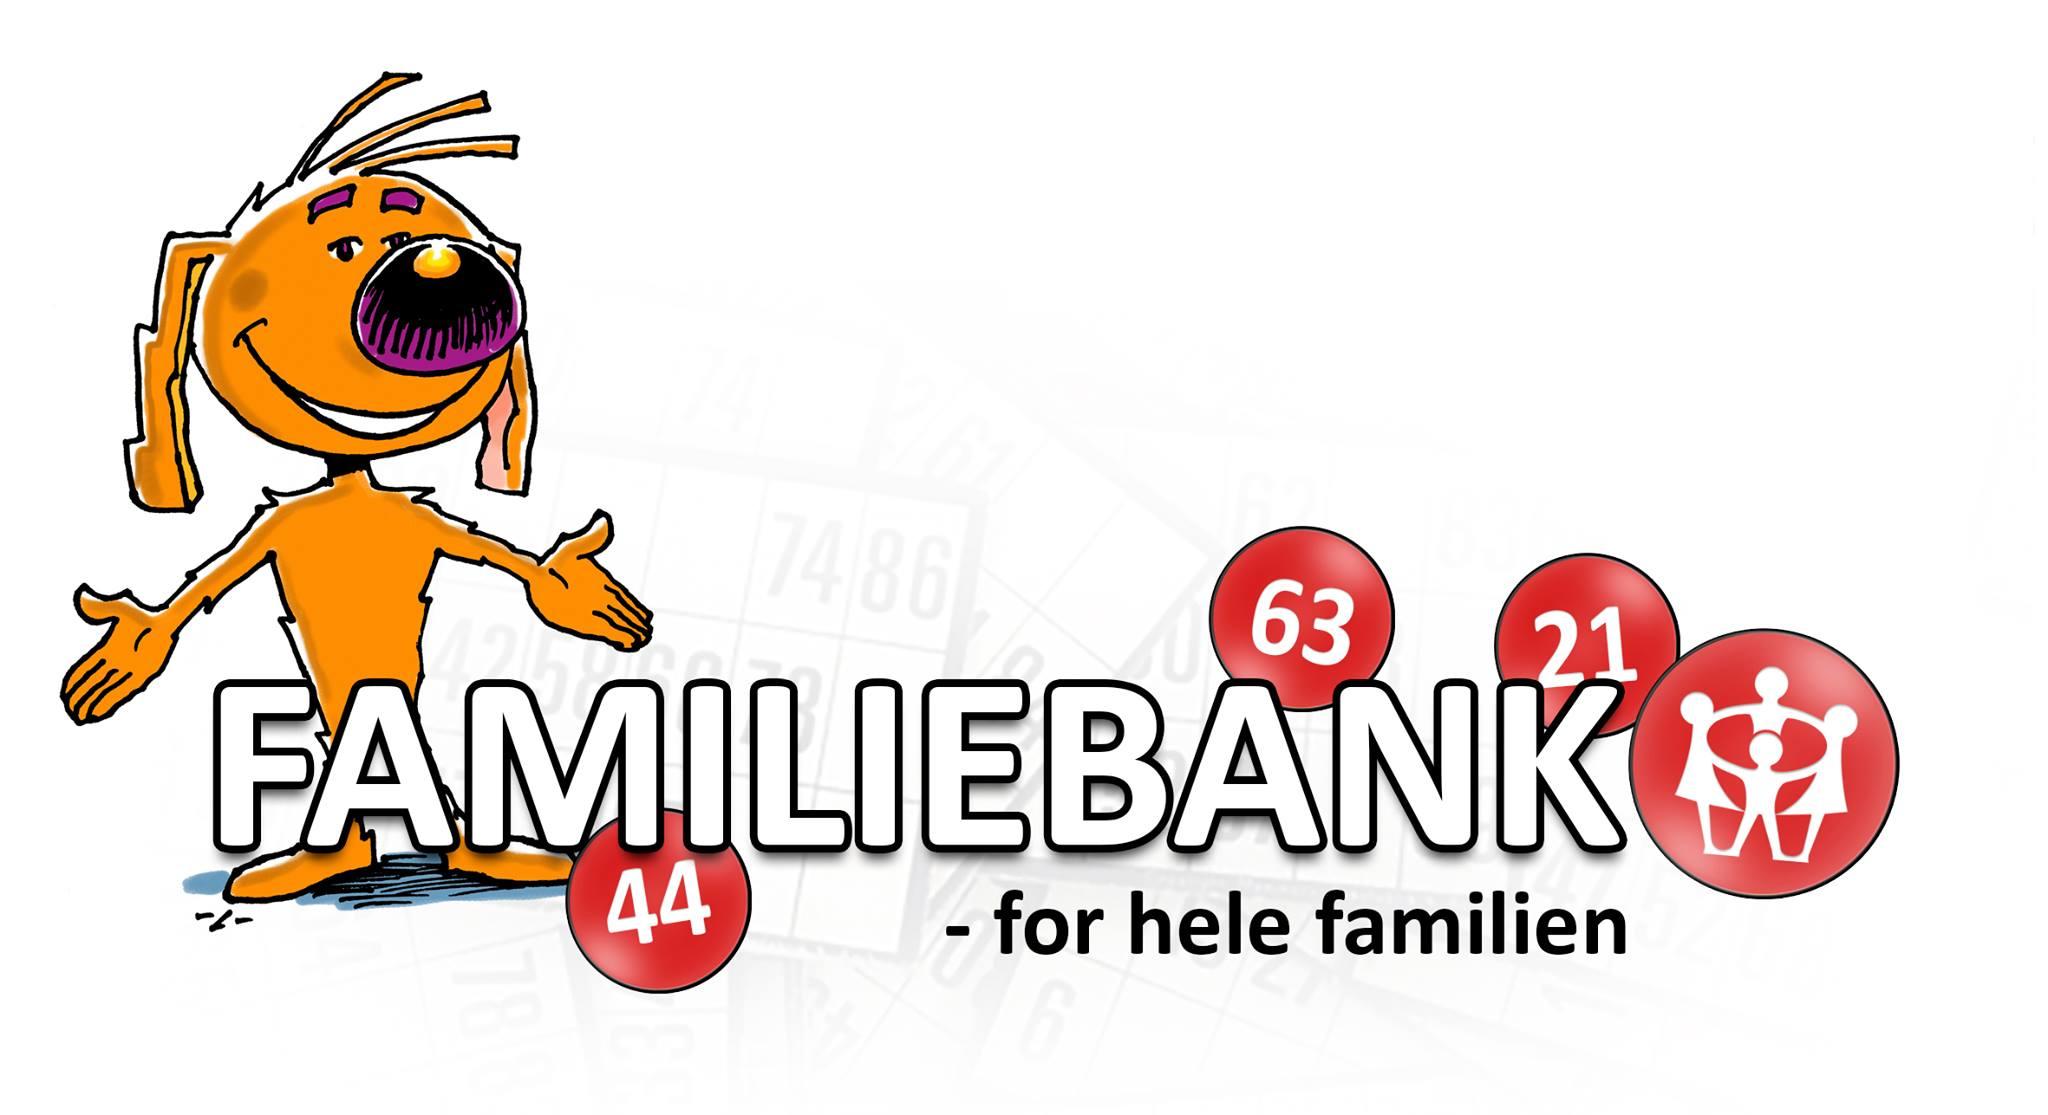 DUI Leg & Virke Egedal, Familiebanko - Vores Egedal